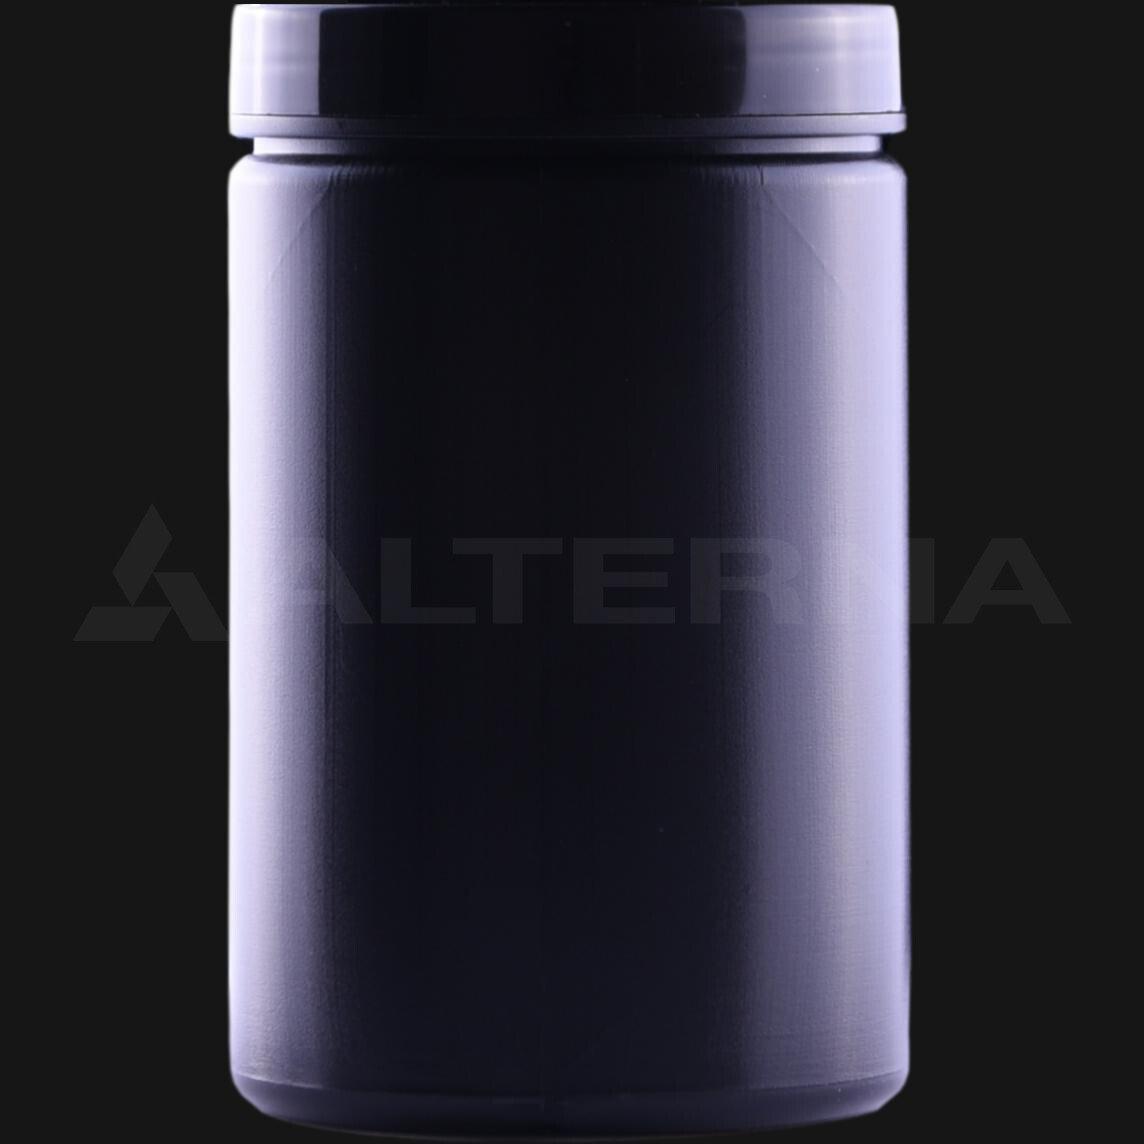 400 ml HDPE Jar with Black Cap